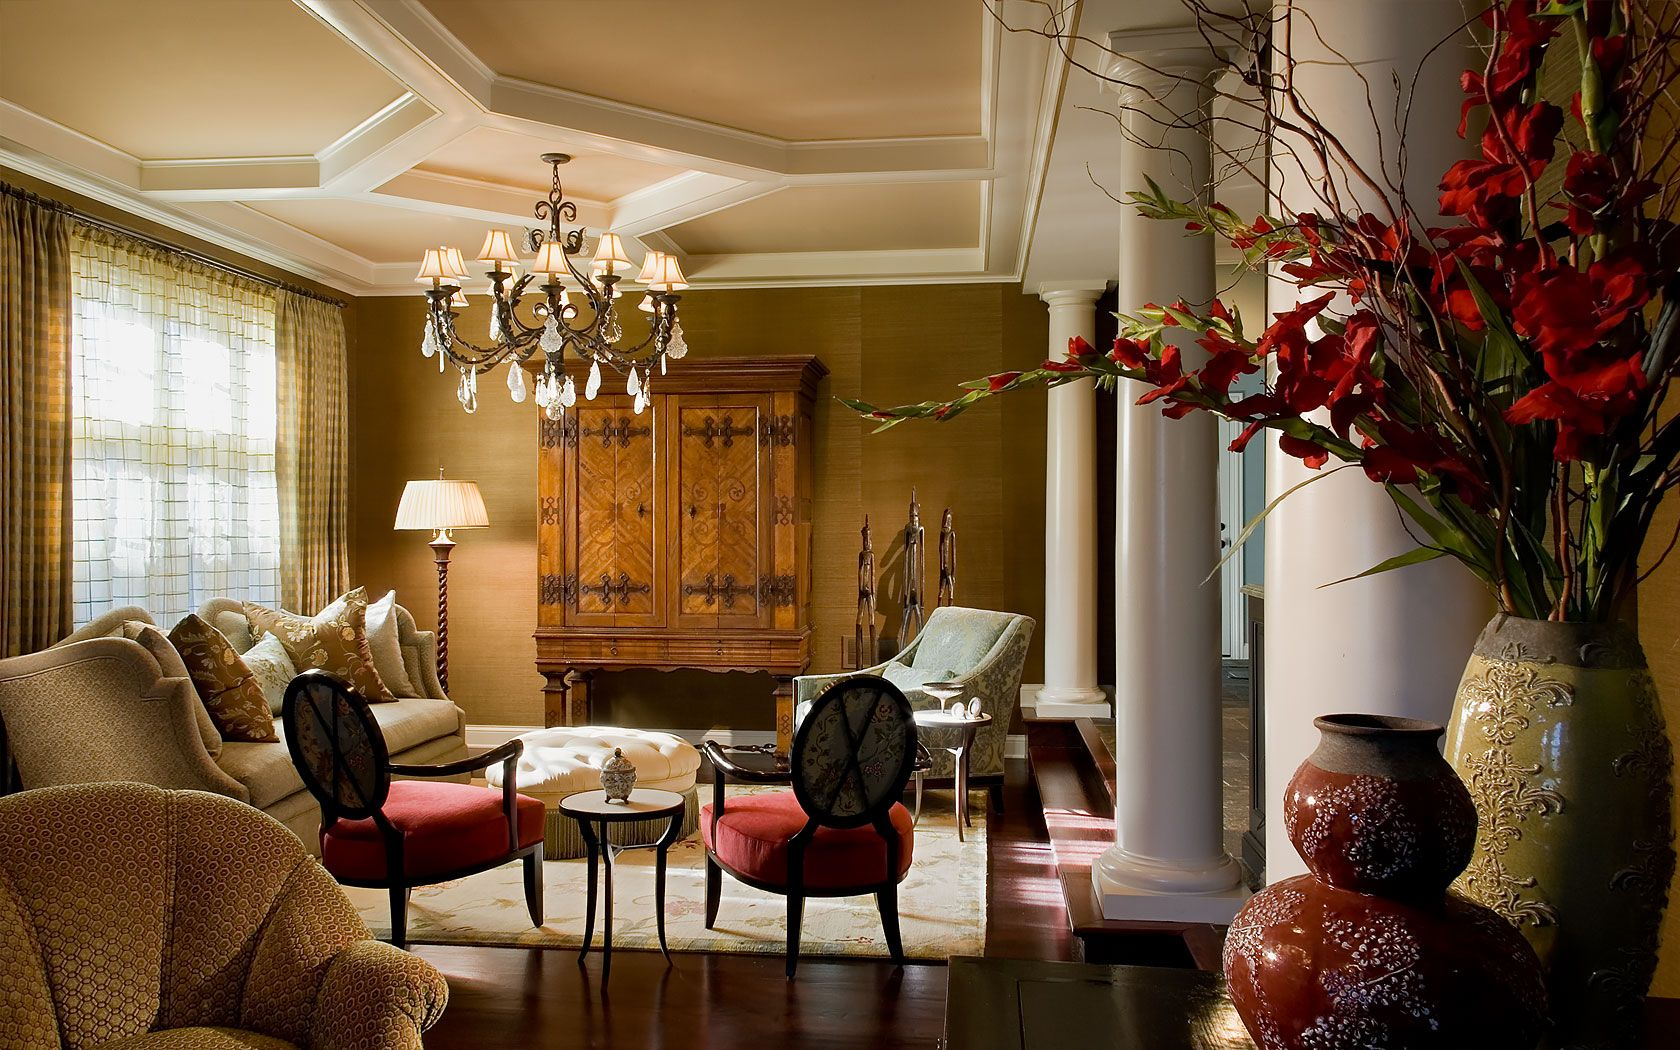 Kaufman segal design interior design firm chicago - Interior design firms chicago ...